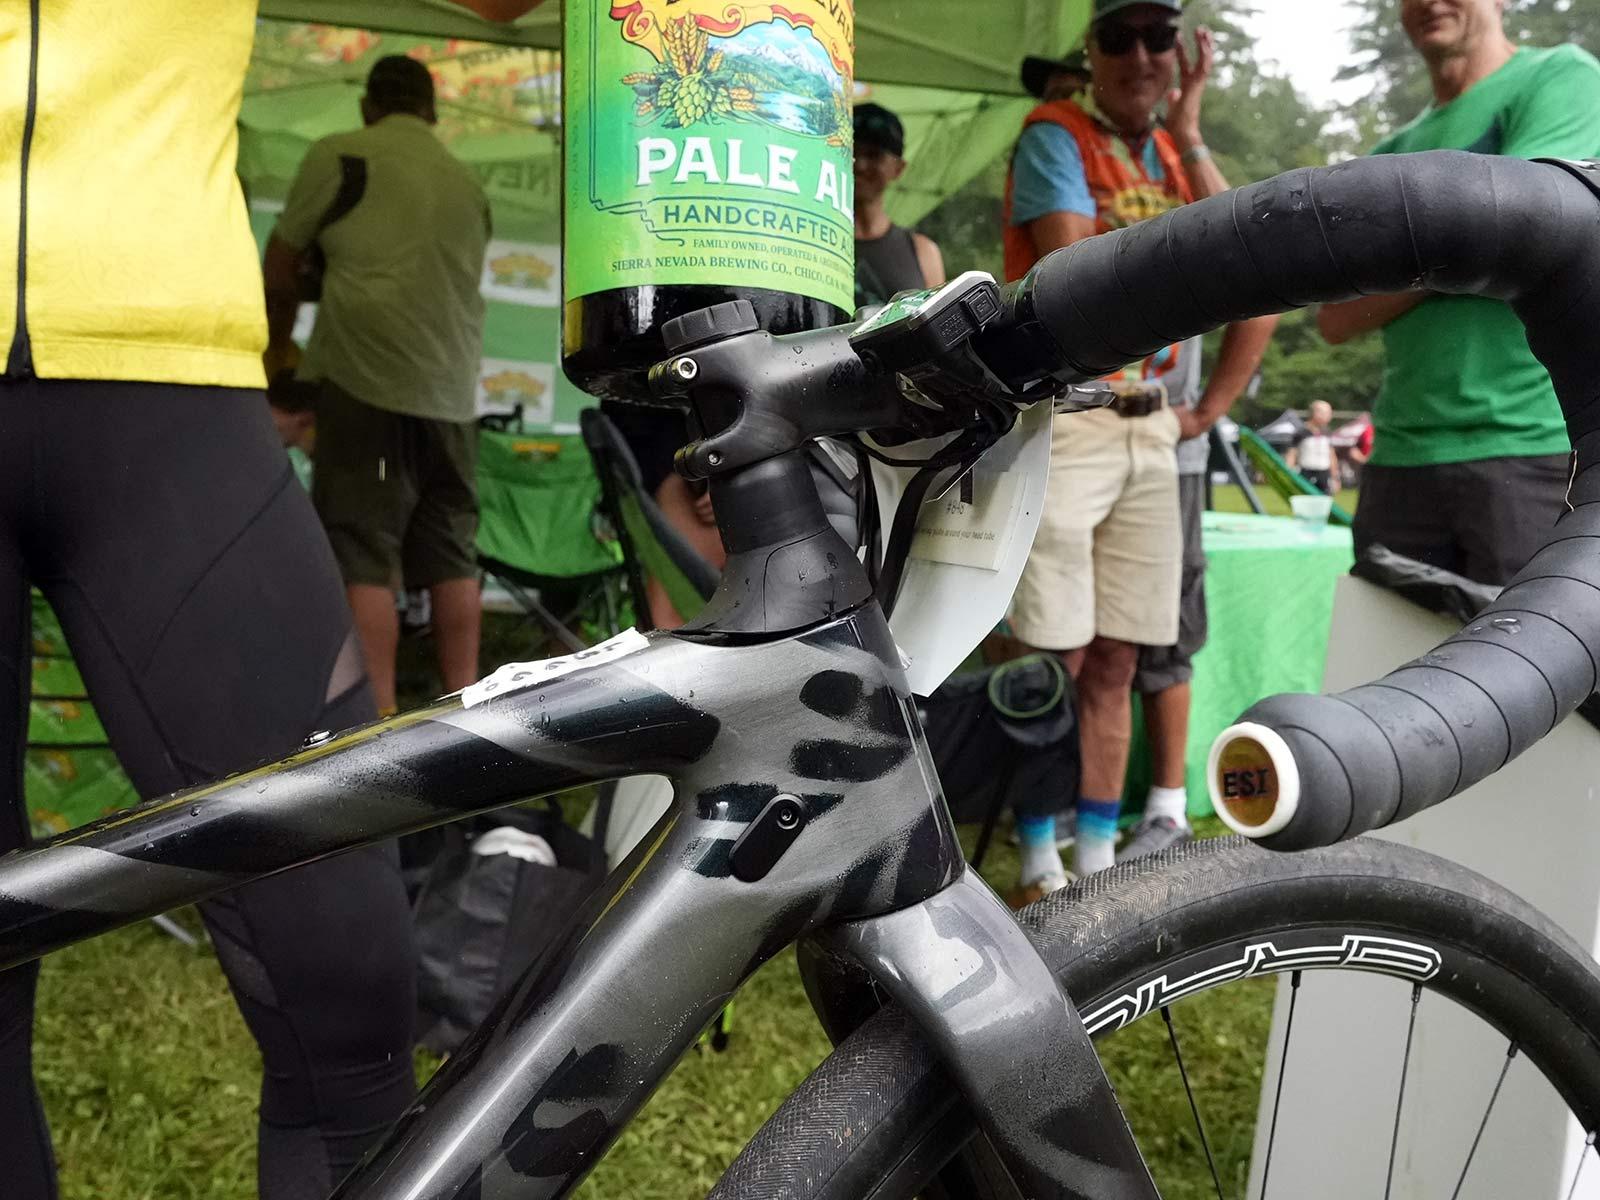 cockpit details of CLIF Pro Team gravel race bike for sofia gomez villafane